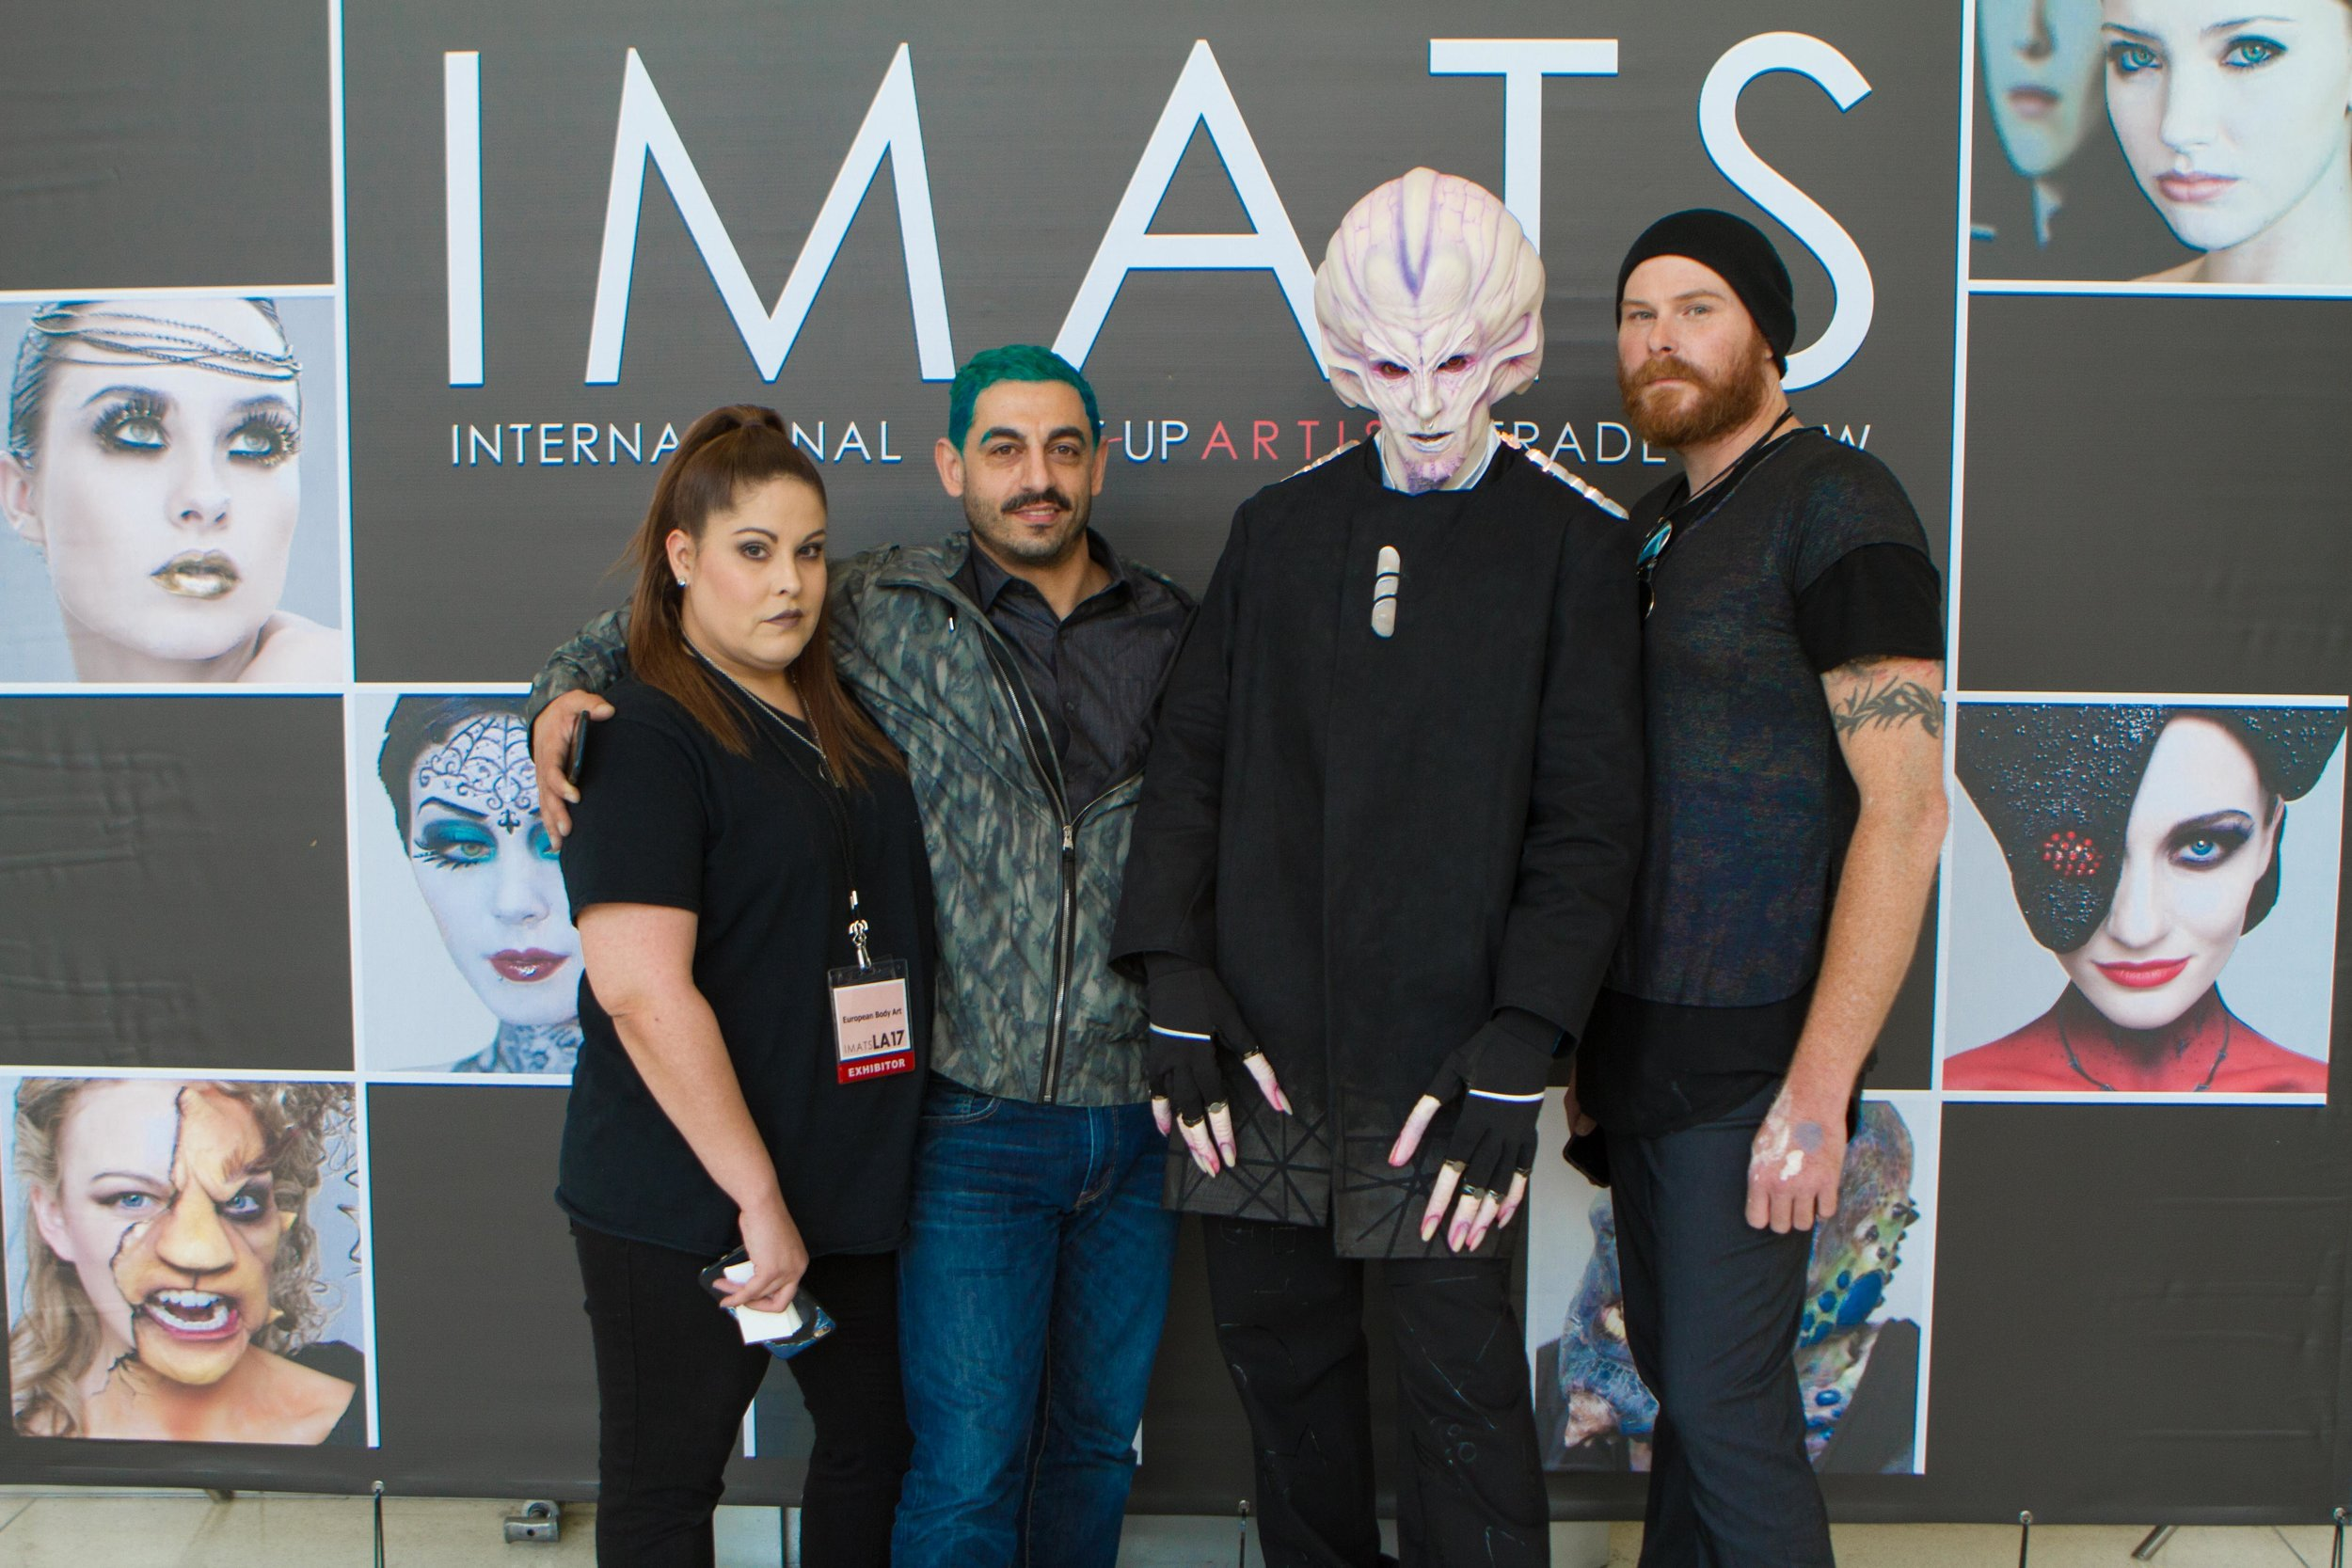 IMATS 2017 - RBFX Greg Lightener & Ernie Omega Alien SFX (www.KyleReaArt.com - www.KyleReaPhotography.com) 16.jpg